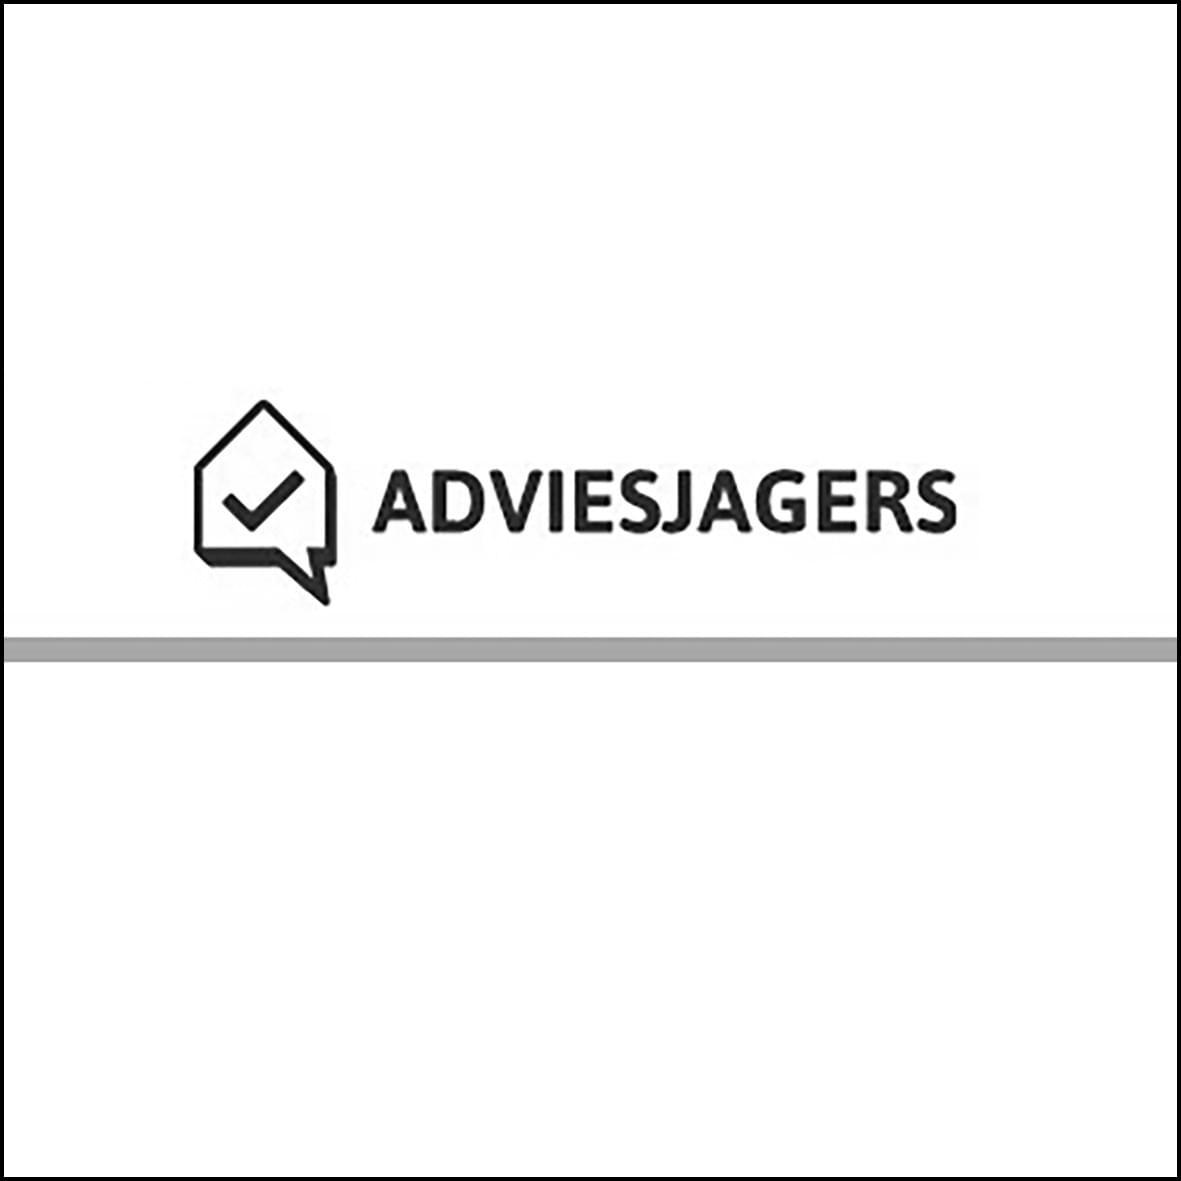 adviesjagers